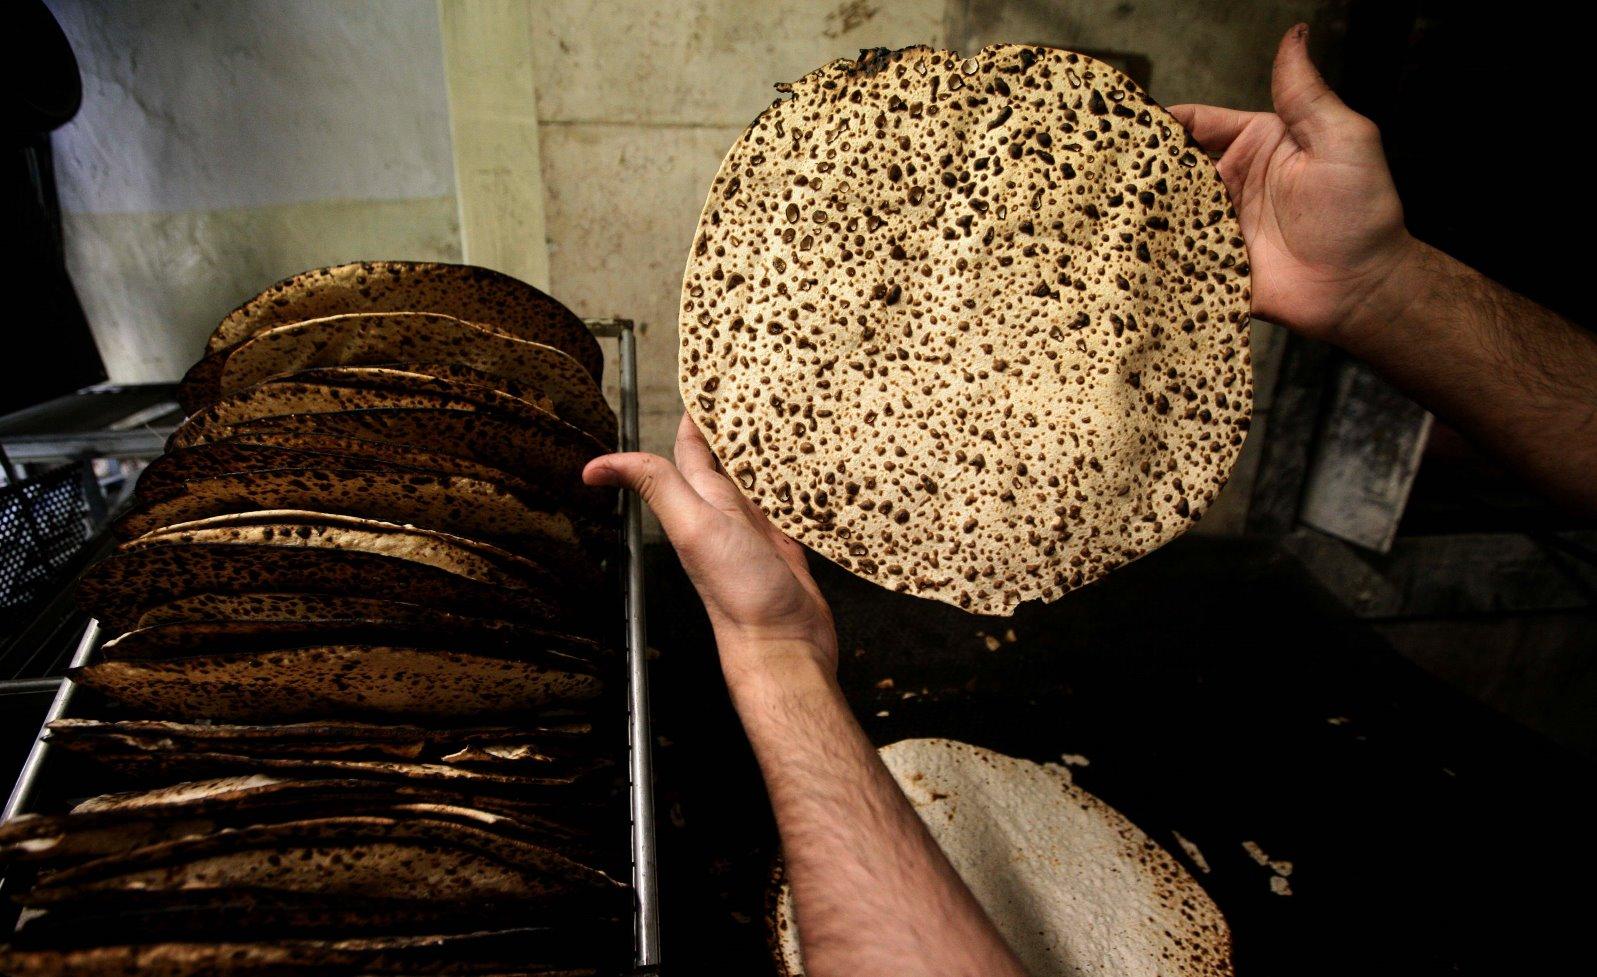 Handmade shmura matzah in Jerusalem. Photo by Abir Sultan/FLASH90